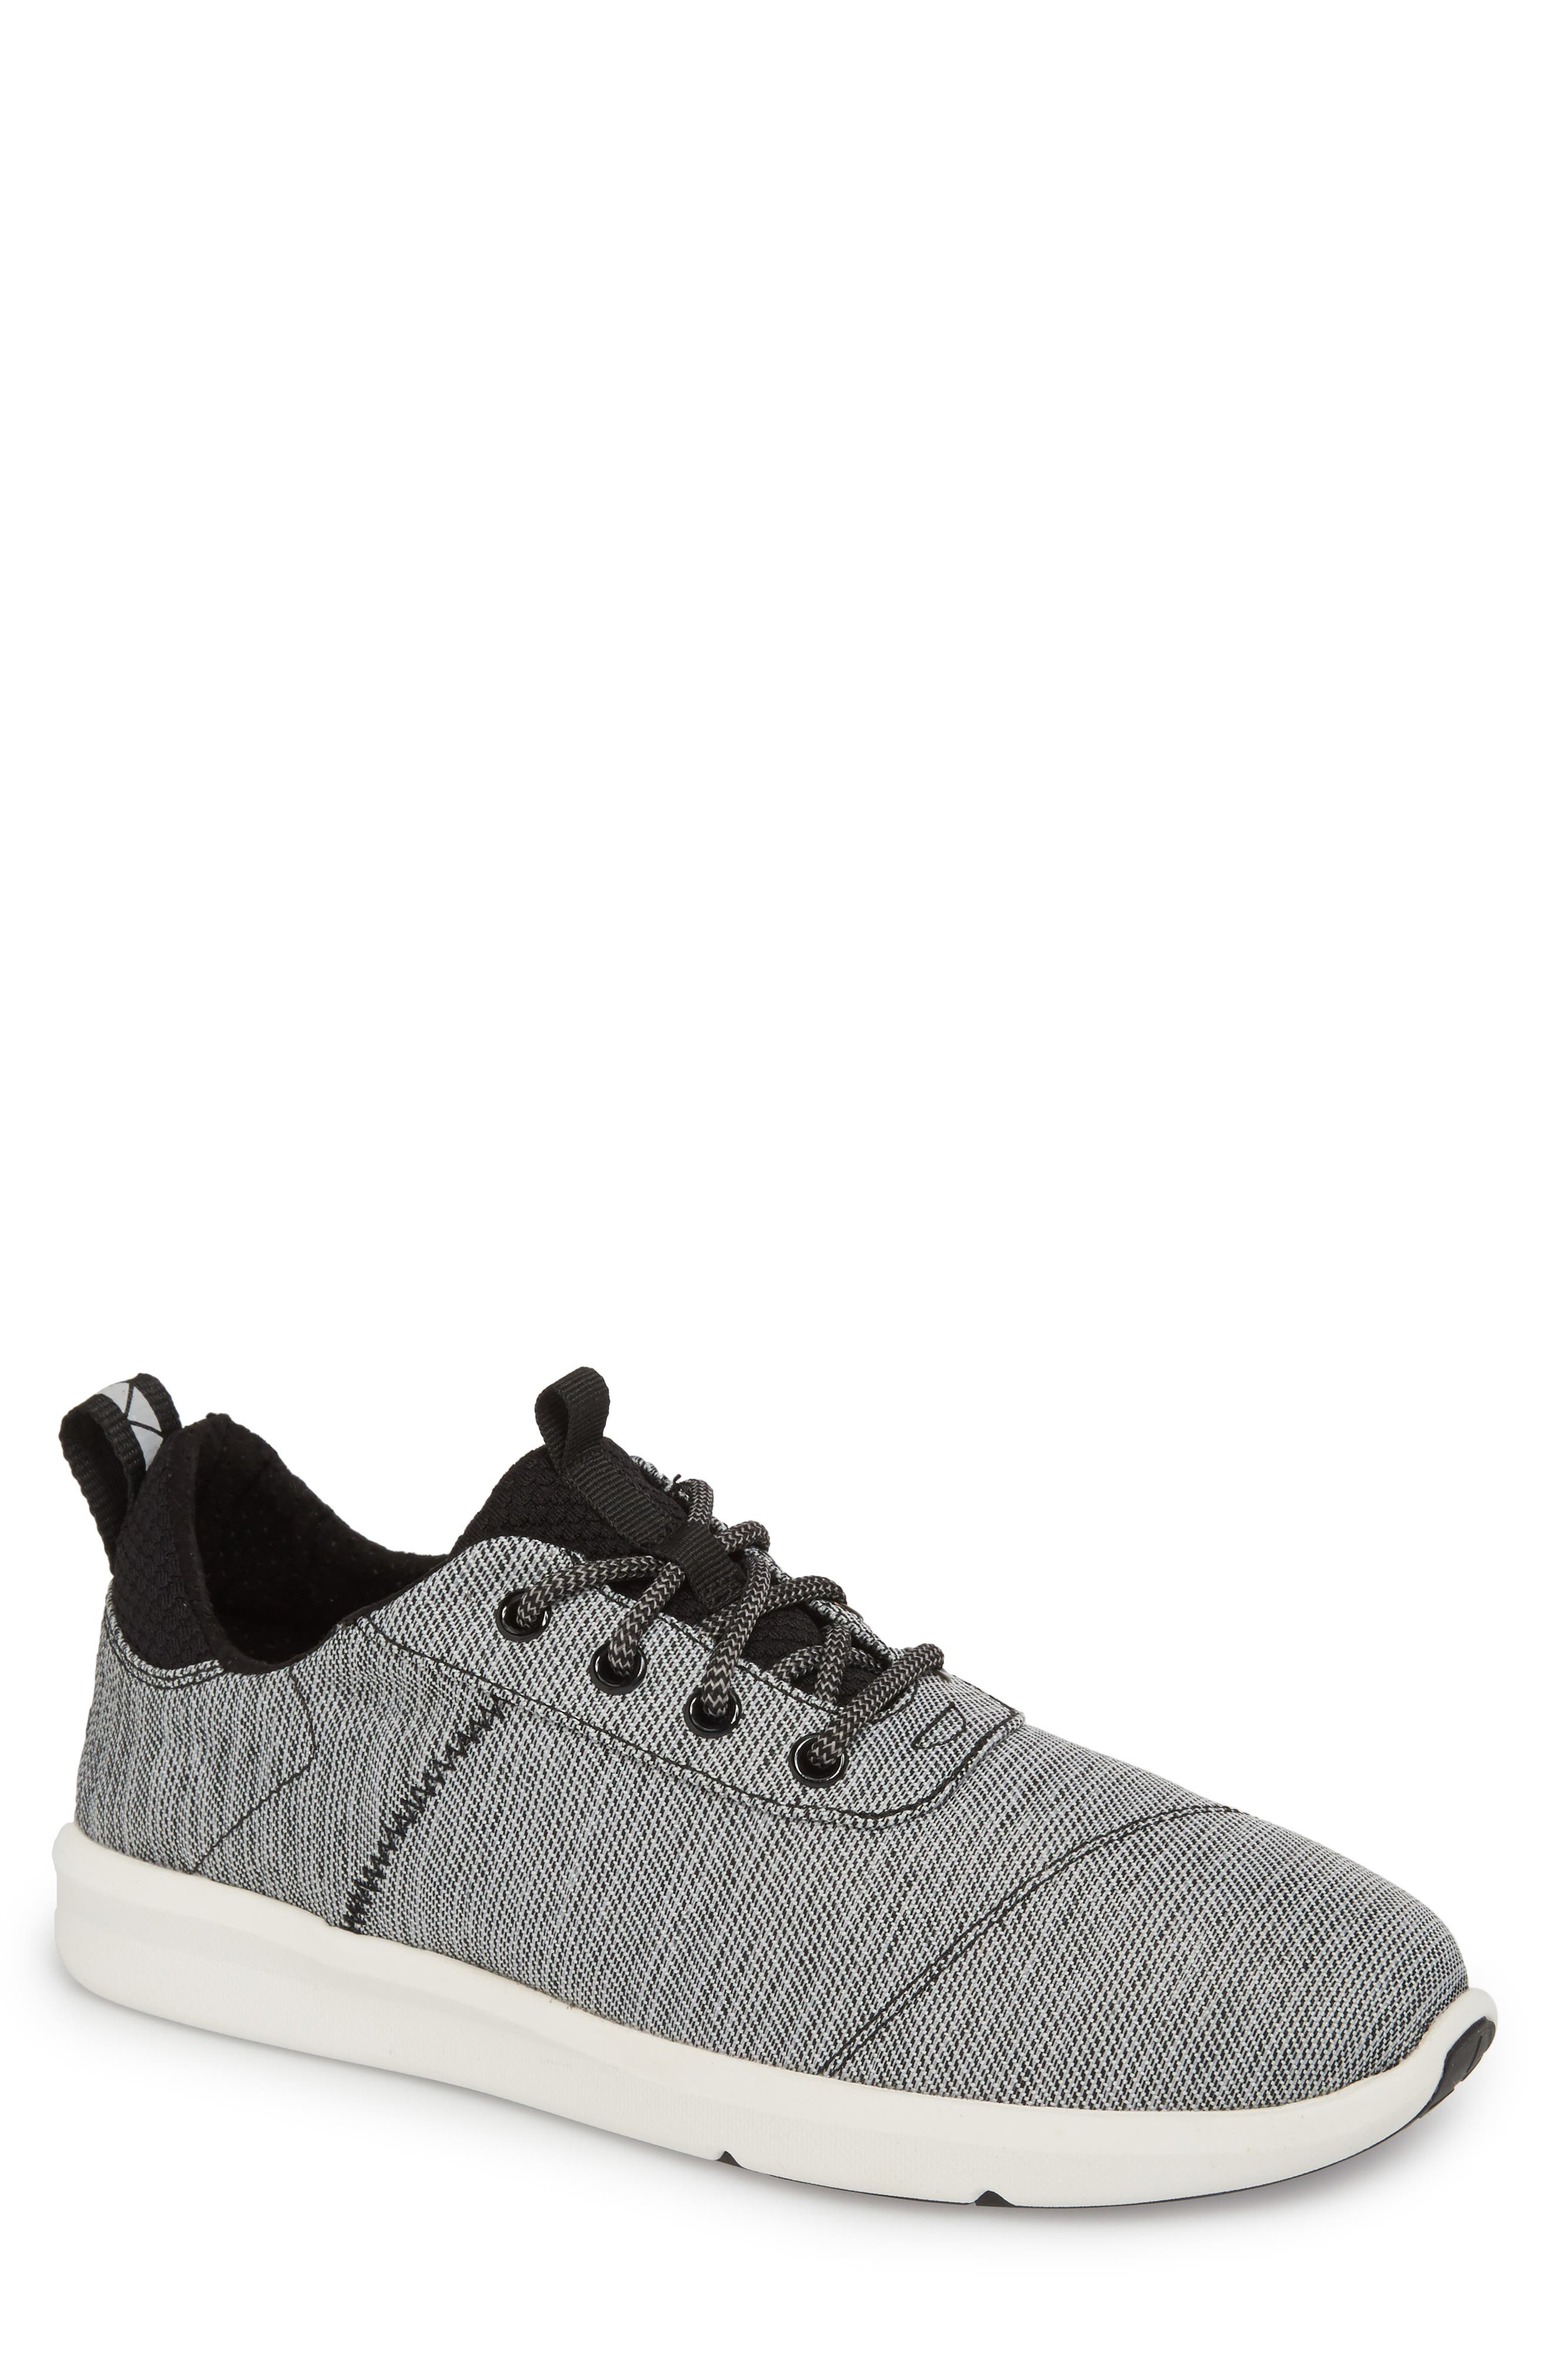 Alternate Image 1 Selected - TOMS Cabrillo Sneaker (Men)